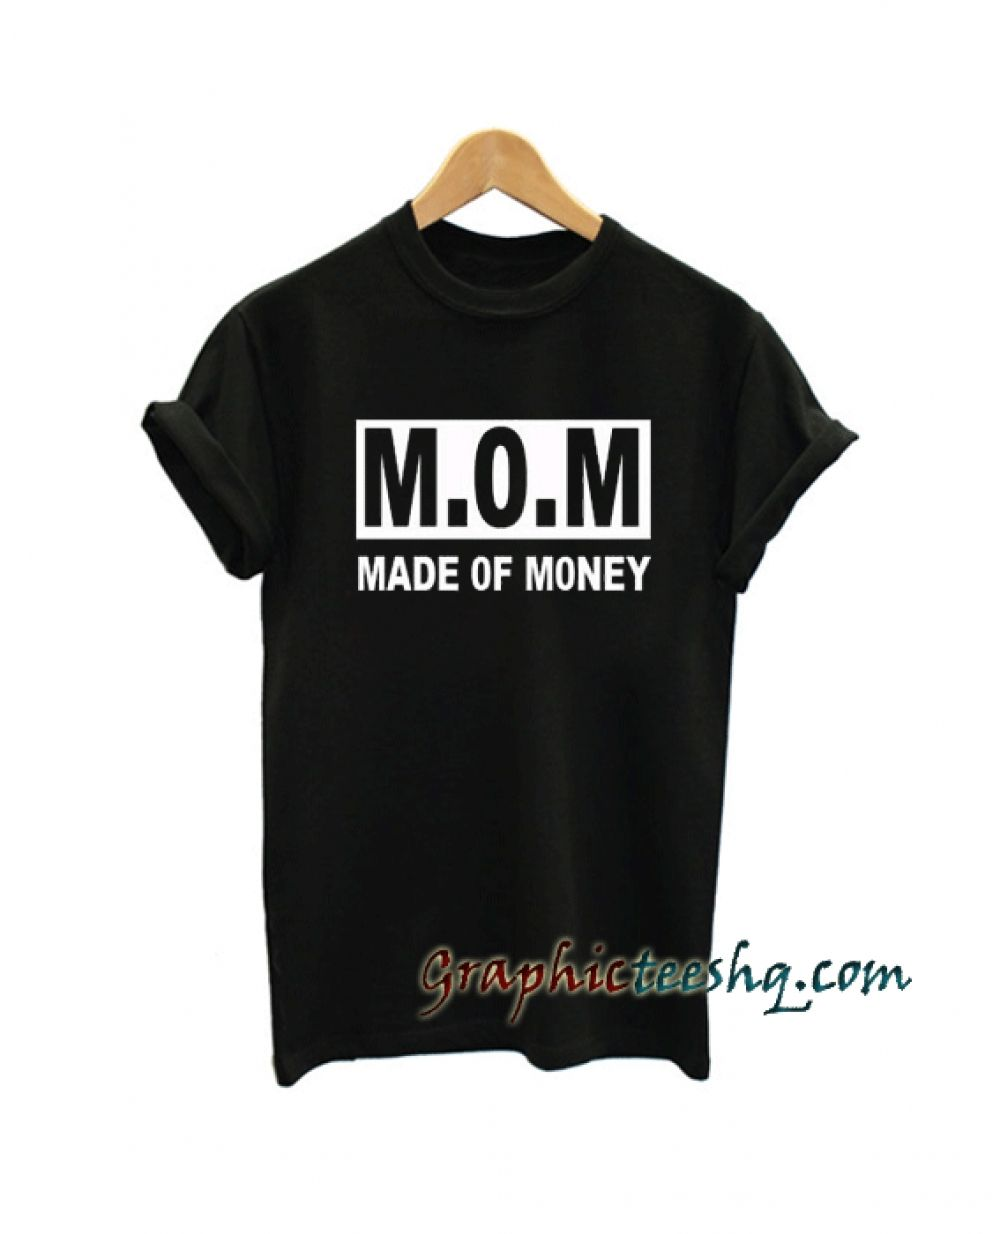 24345a54 mom made of money Tee Shirt Price: 13.50 #style #fashion #tshirts #tee  #tshirtdesign#instafashion #black #cute #art #amazing#funny #webstagram  #lol #hot ...